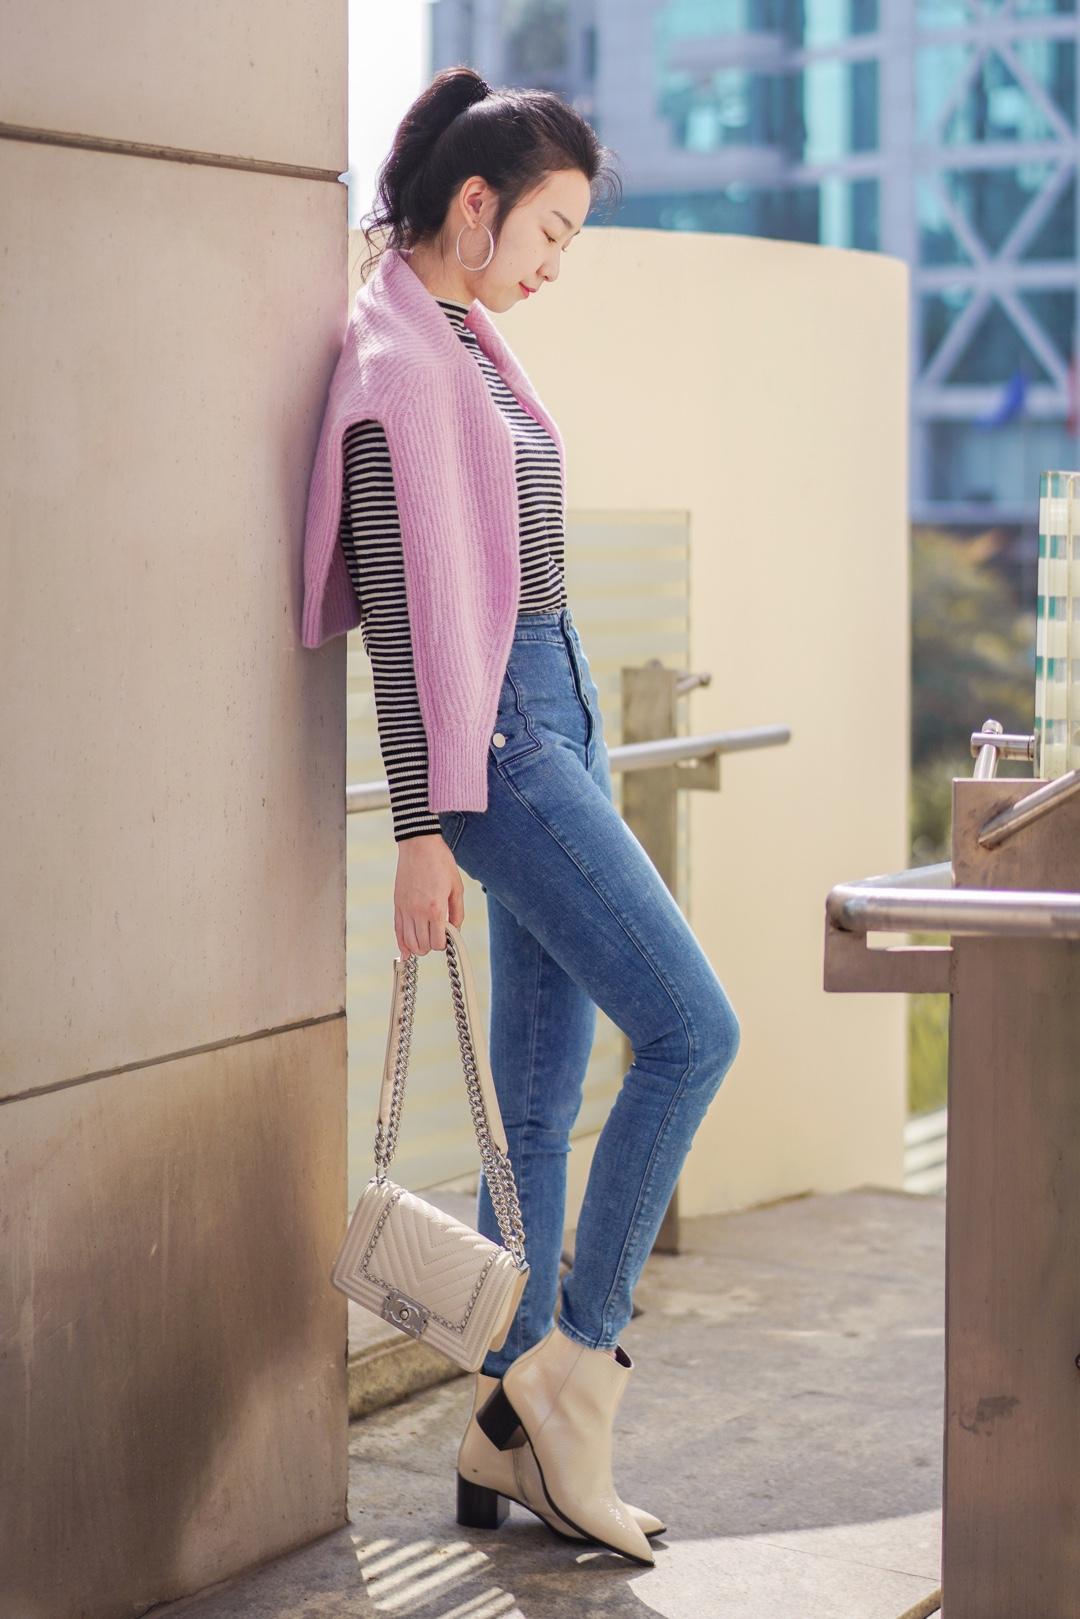 OOTD   春日的毛衣&内搭毛衣。Stripe is the new black.   毛衣&靴子:Everlane 裤子:J Brand  包:Chanel  #三月显瘦指南:这样穿,立马显瘦10斤#